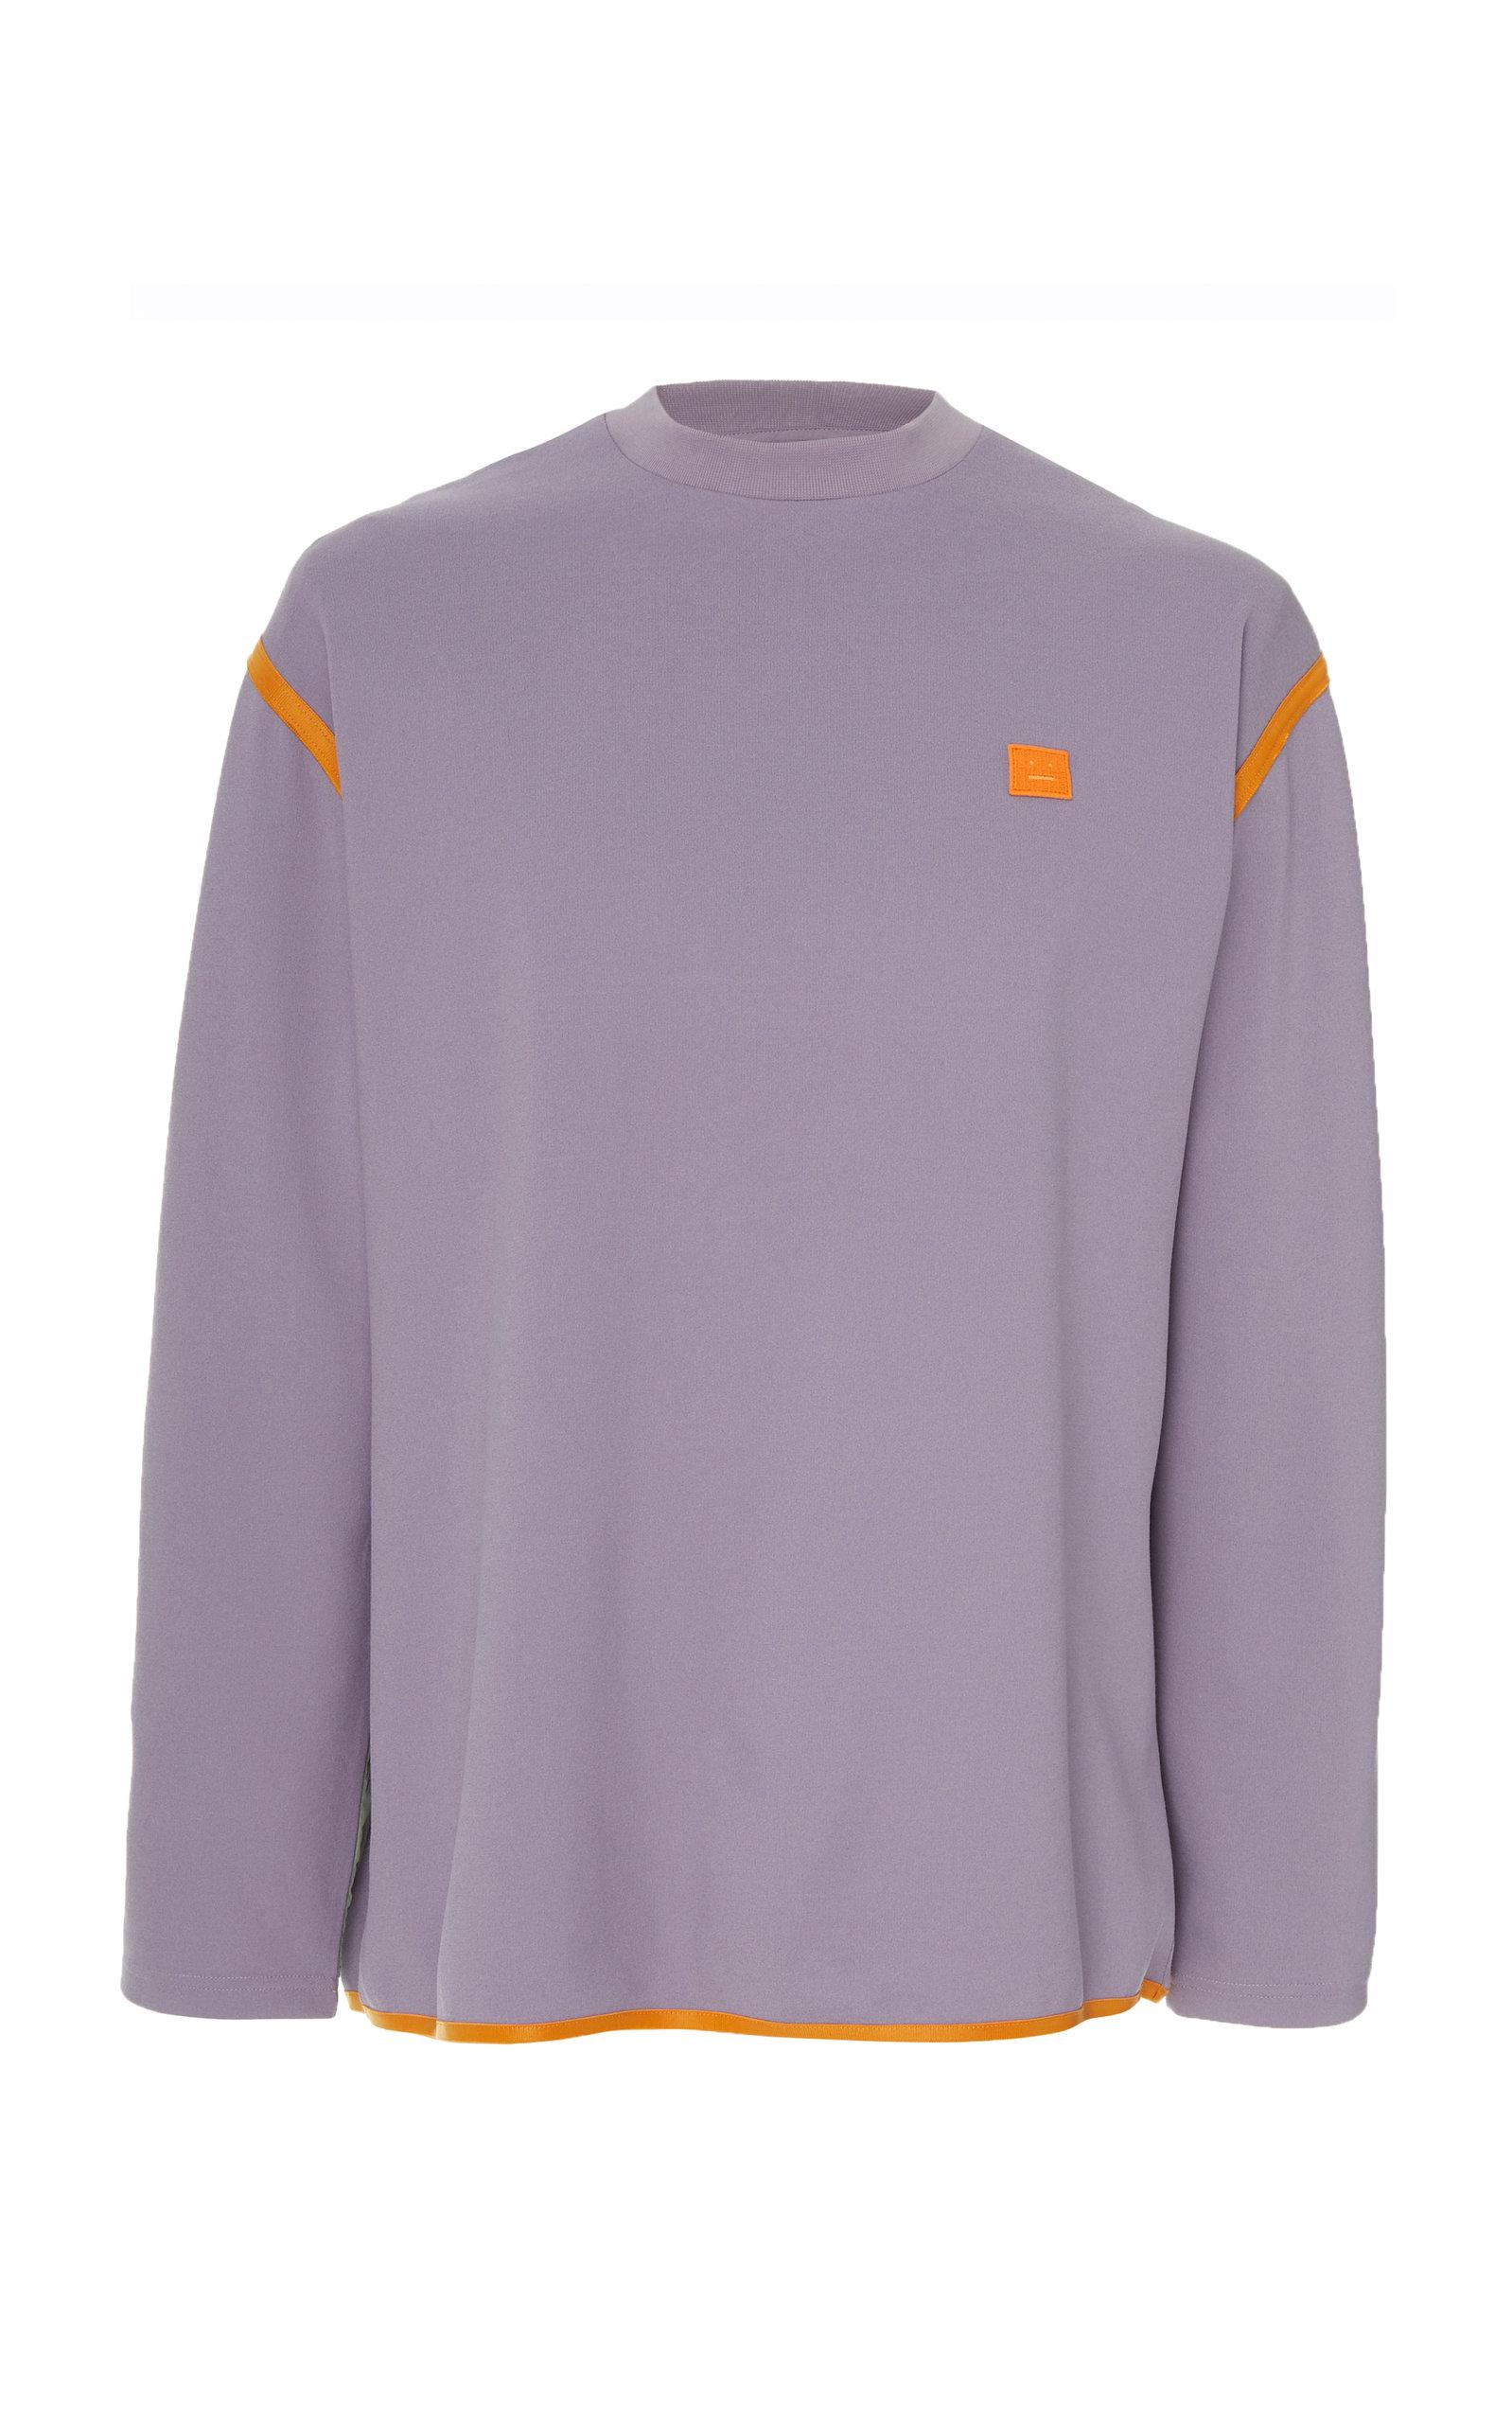 Acne Studios Sweatshirts Ferke Shell-Paneled Jersey Sweatshirt